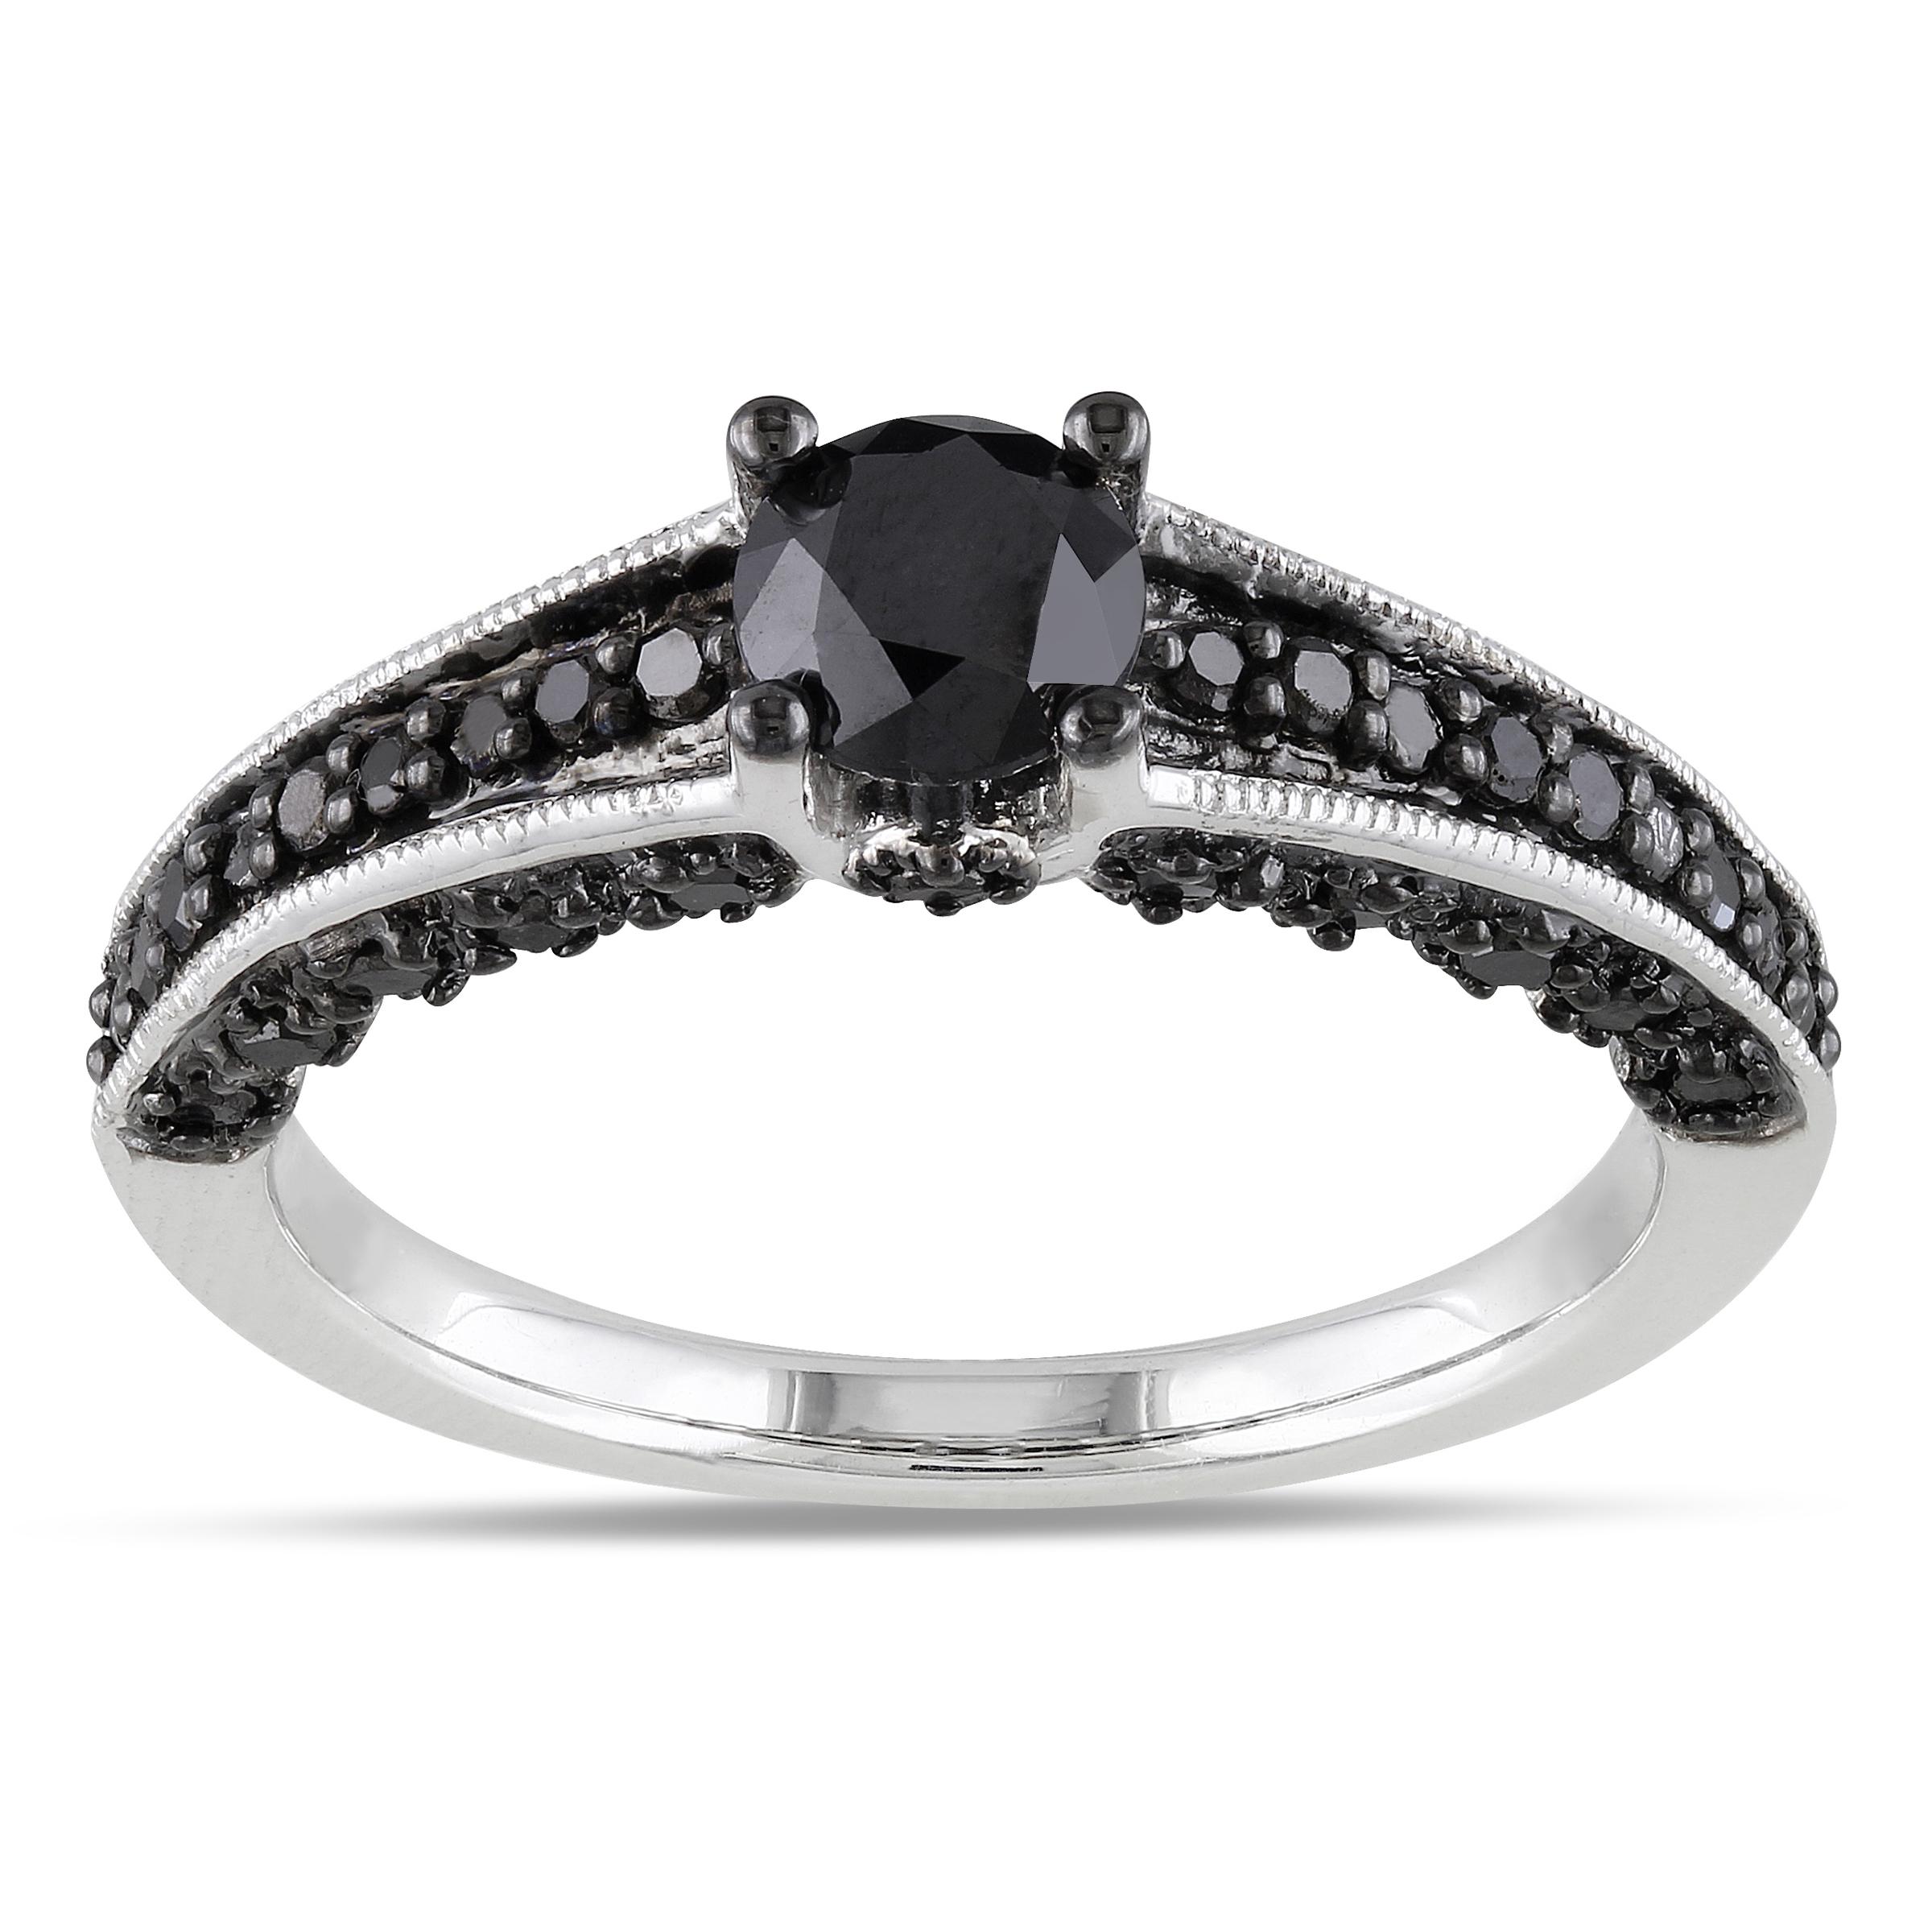 Black Diamond Wedding Rings synrgyus